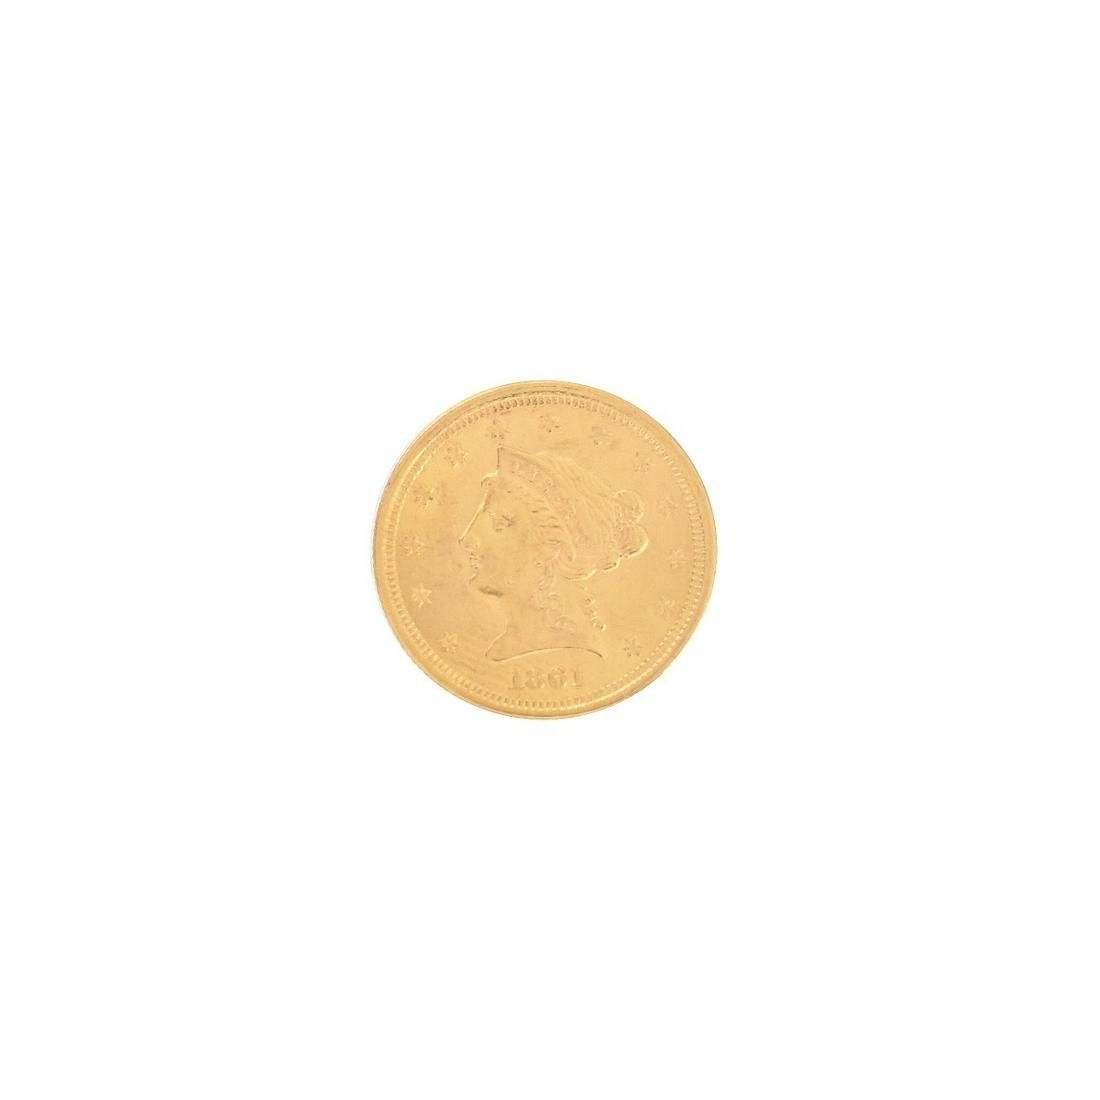 1861 US Gold Liberty Head/Civil War $2.50